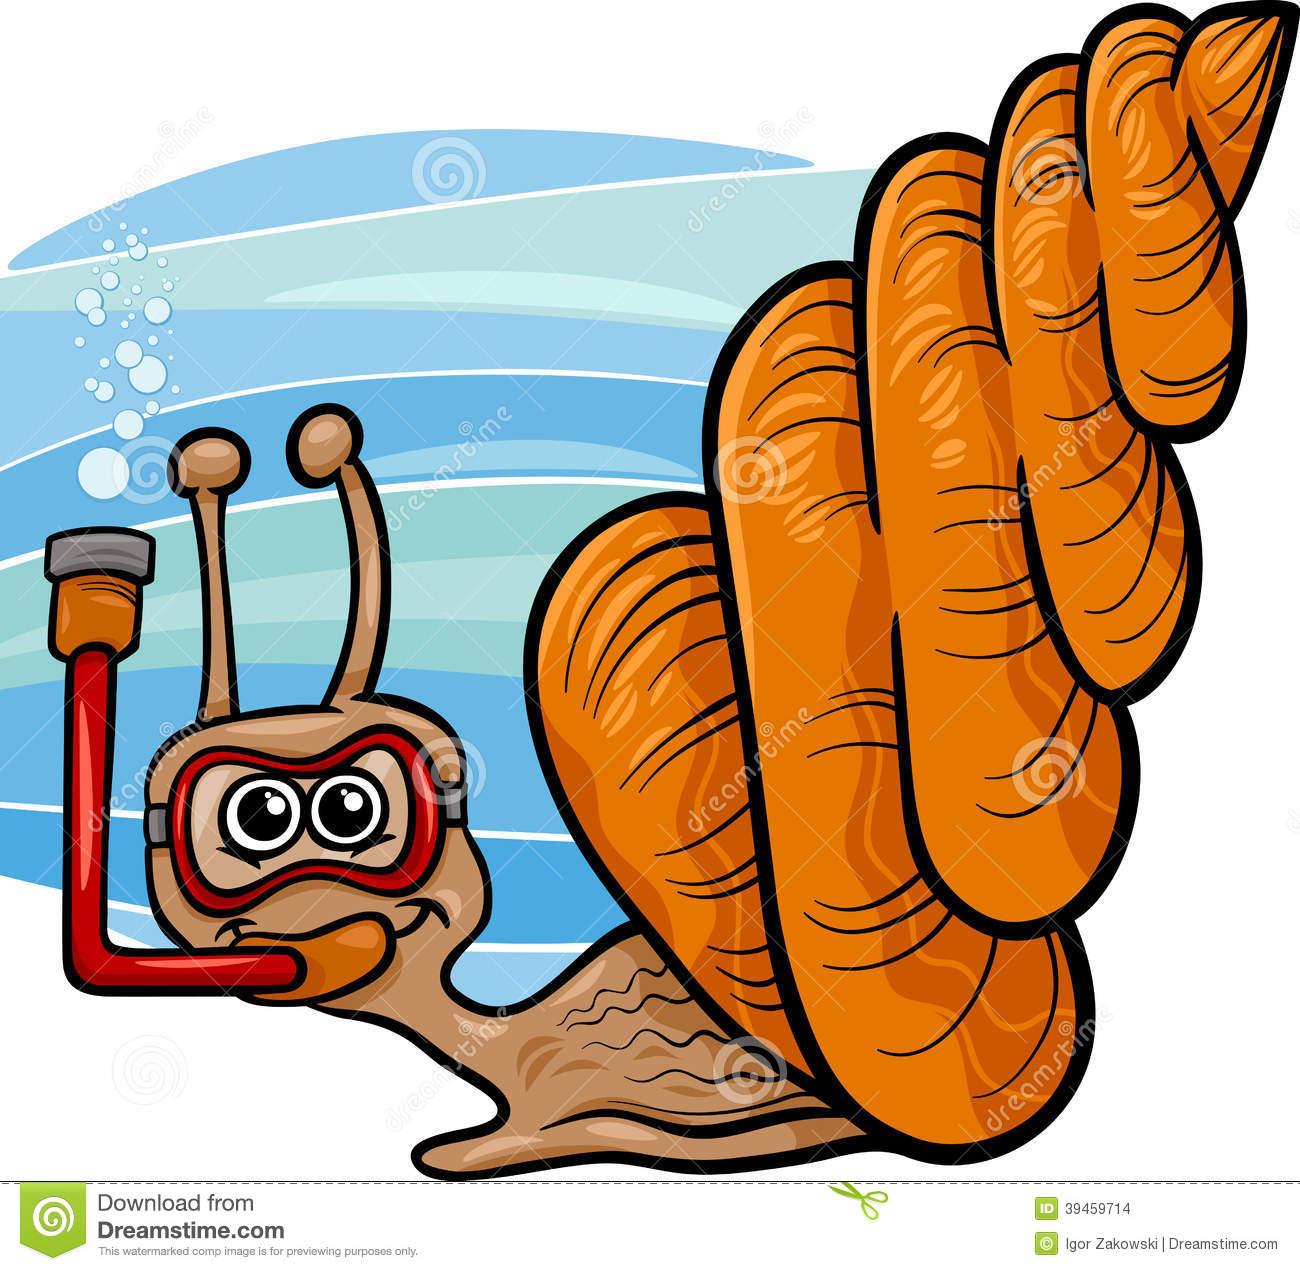 Mollusc clipart sea snail Sea%20snail%20clip%20art Clipart Panda Snail Sea